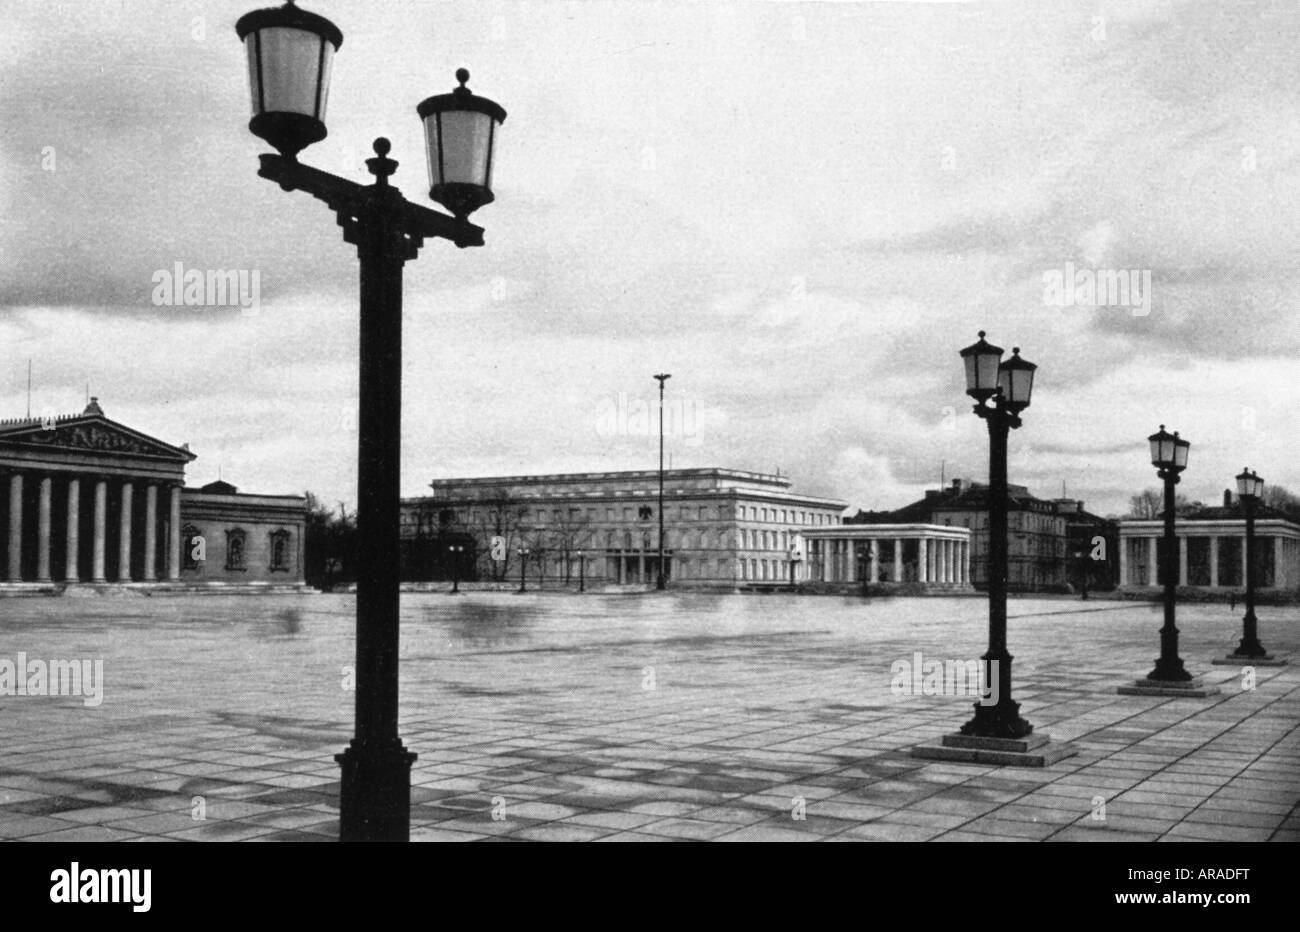 Geography Travel Germany Munich Konigsplatz View 1930s 30s Nazi Architecture Paul Ludwig Troost Third Reich Nazism